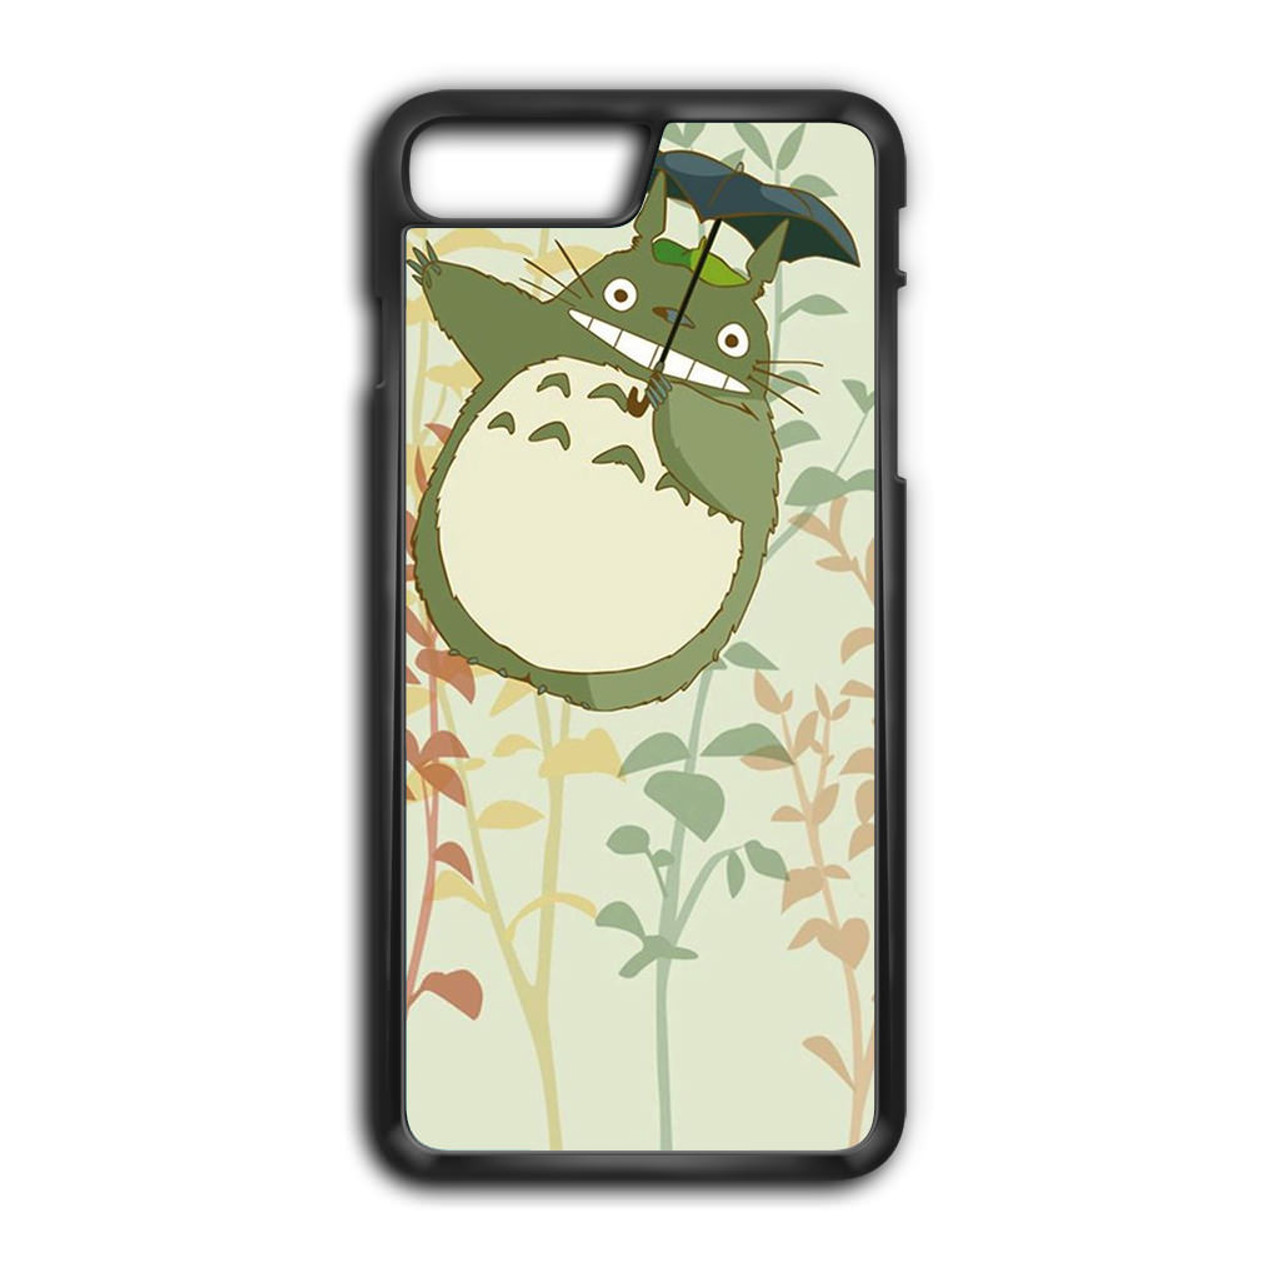 reputable site cf043 61f18 My Neighbor Totoro Cute iPhone 8 Plus Case